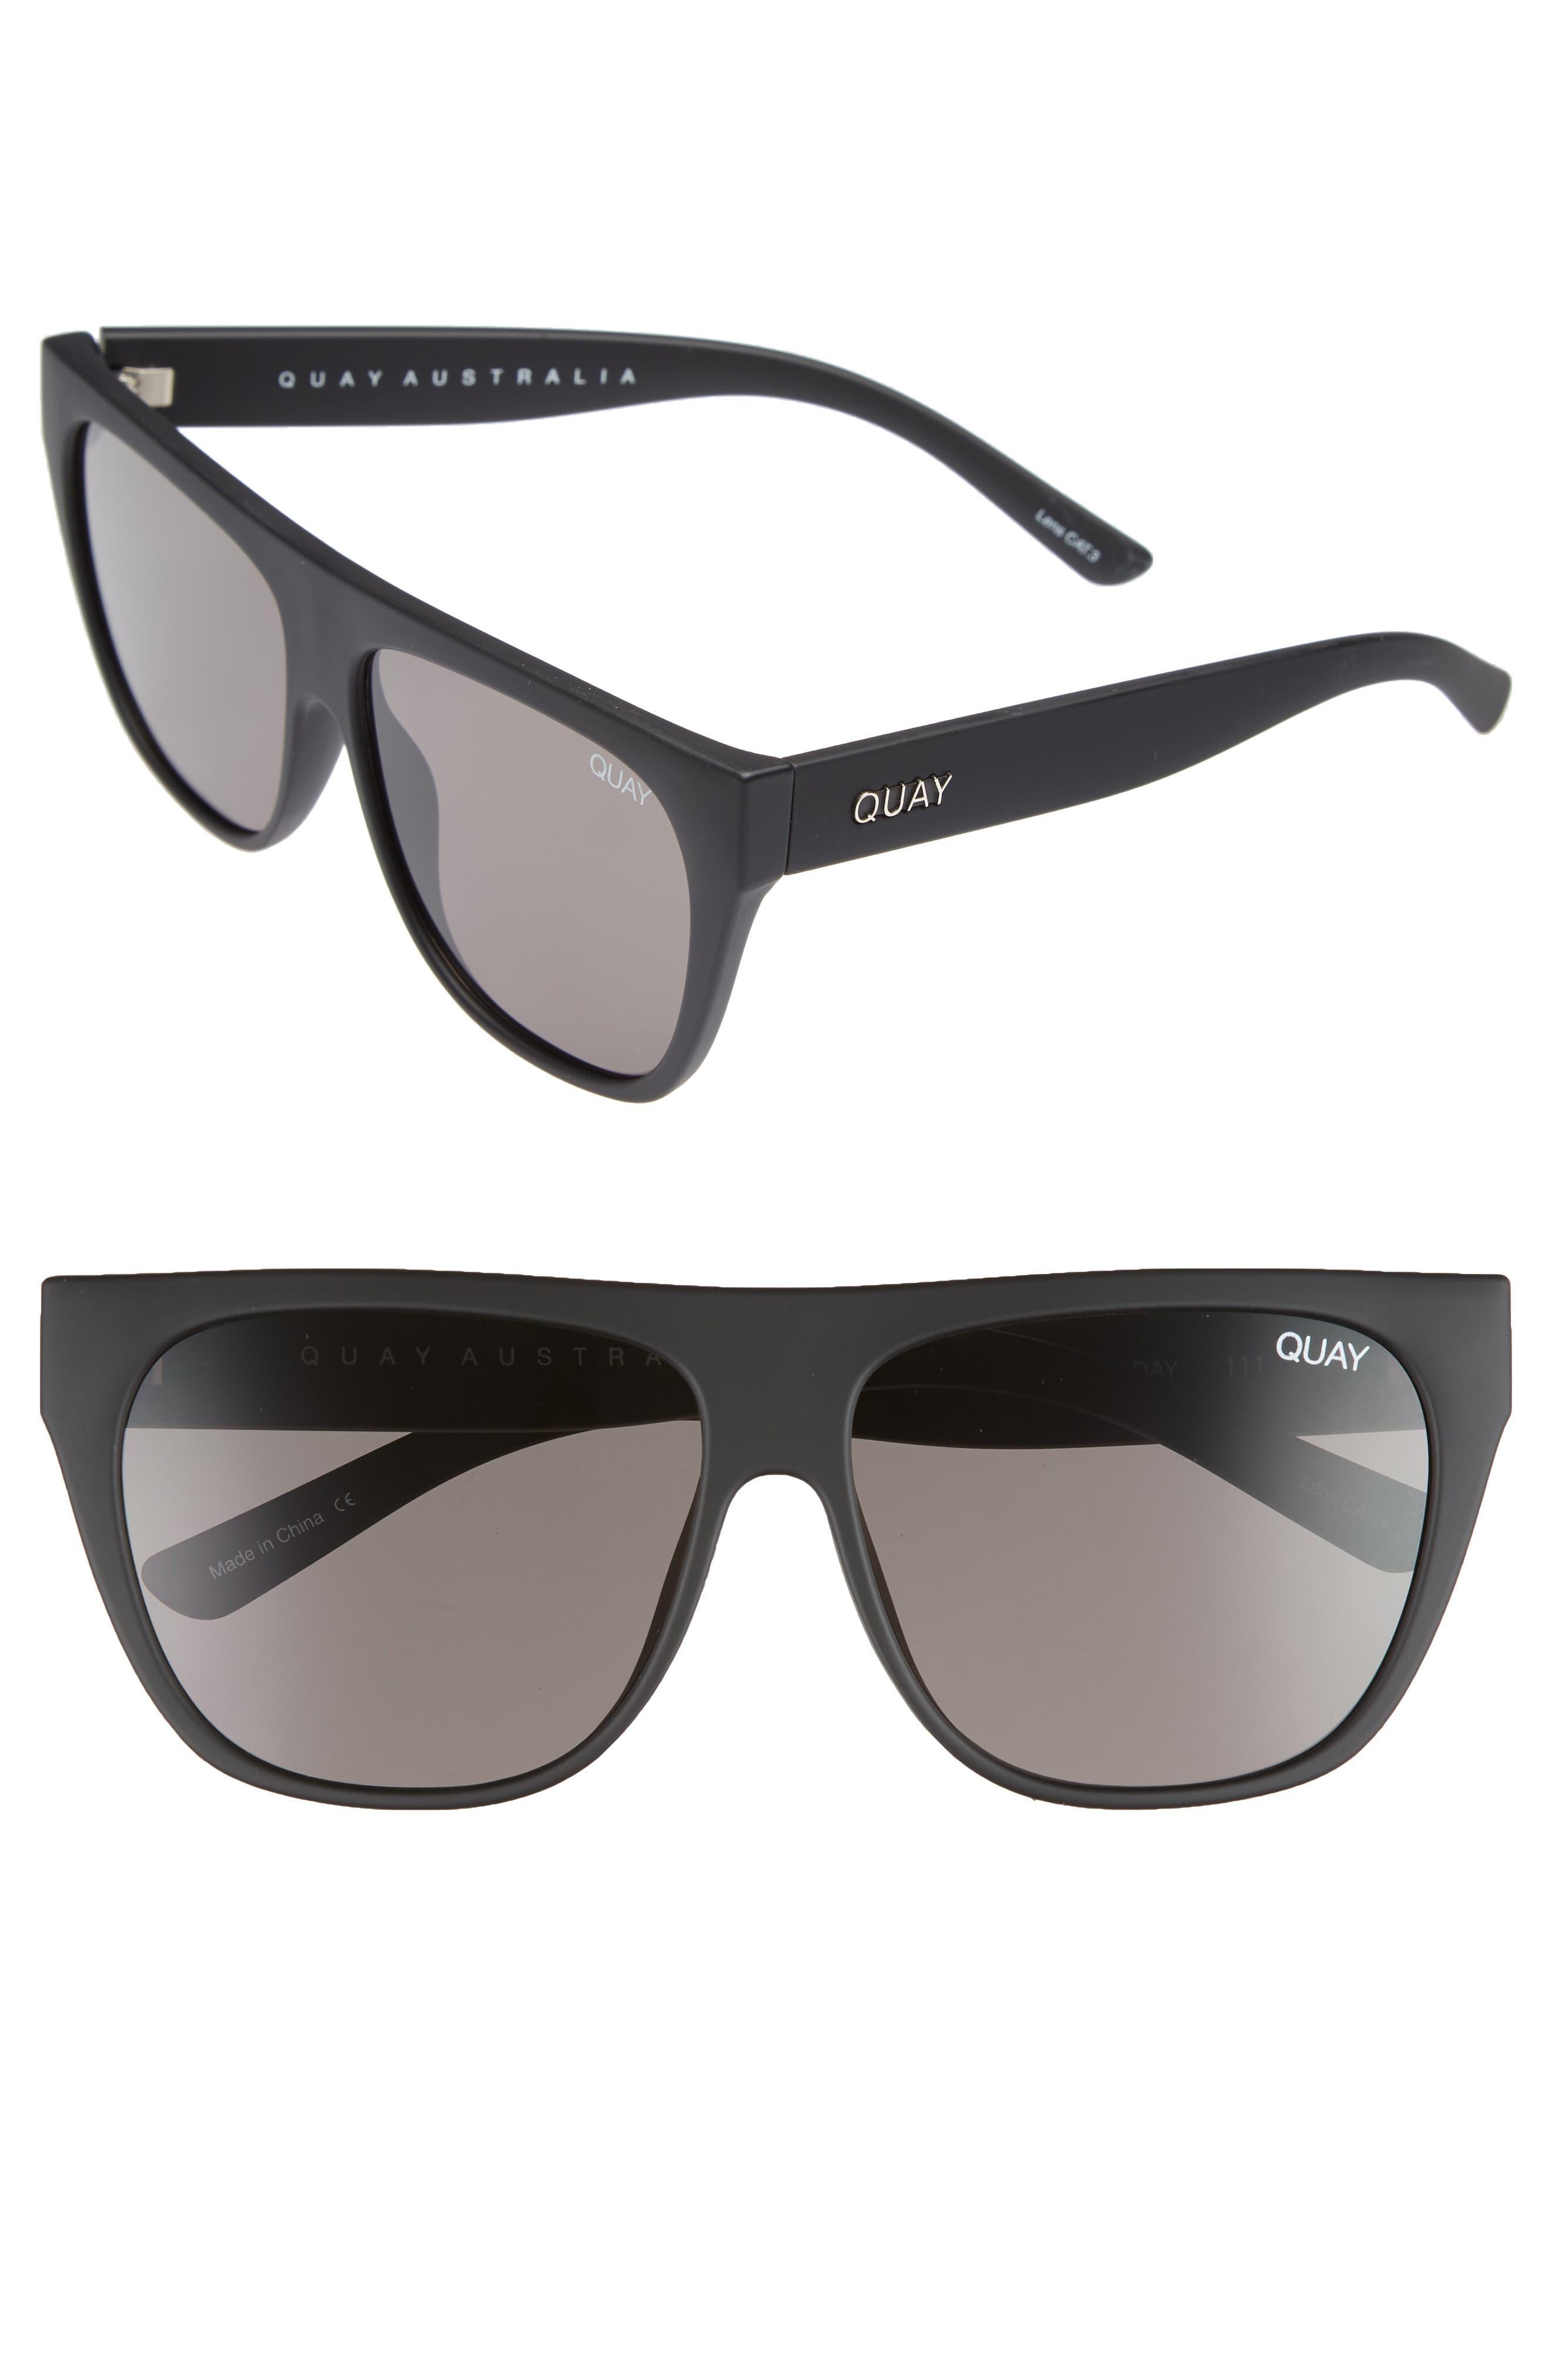 Quay Australia x Tony Bianco Drama by Day 55mm Square Sunglasses